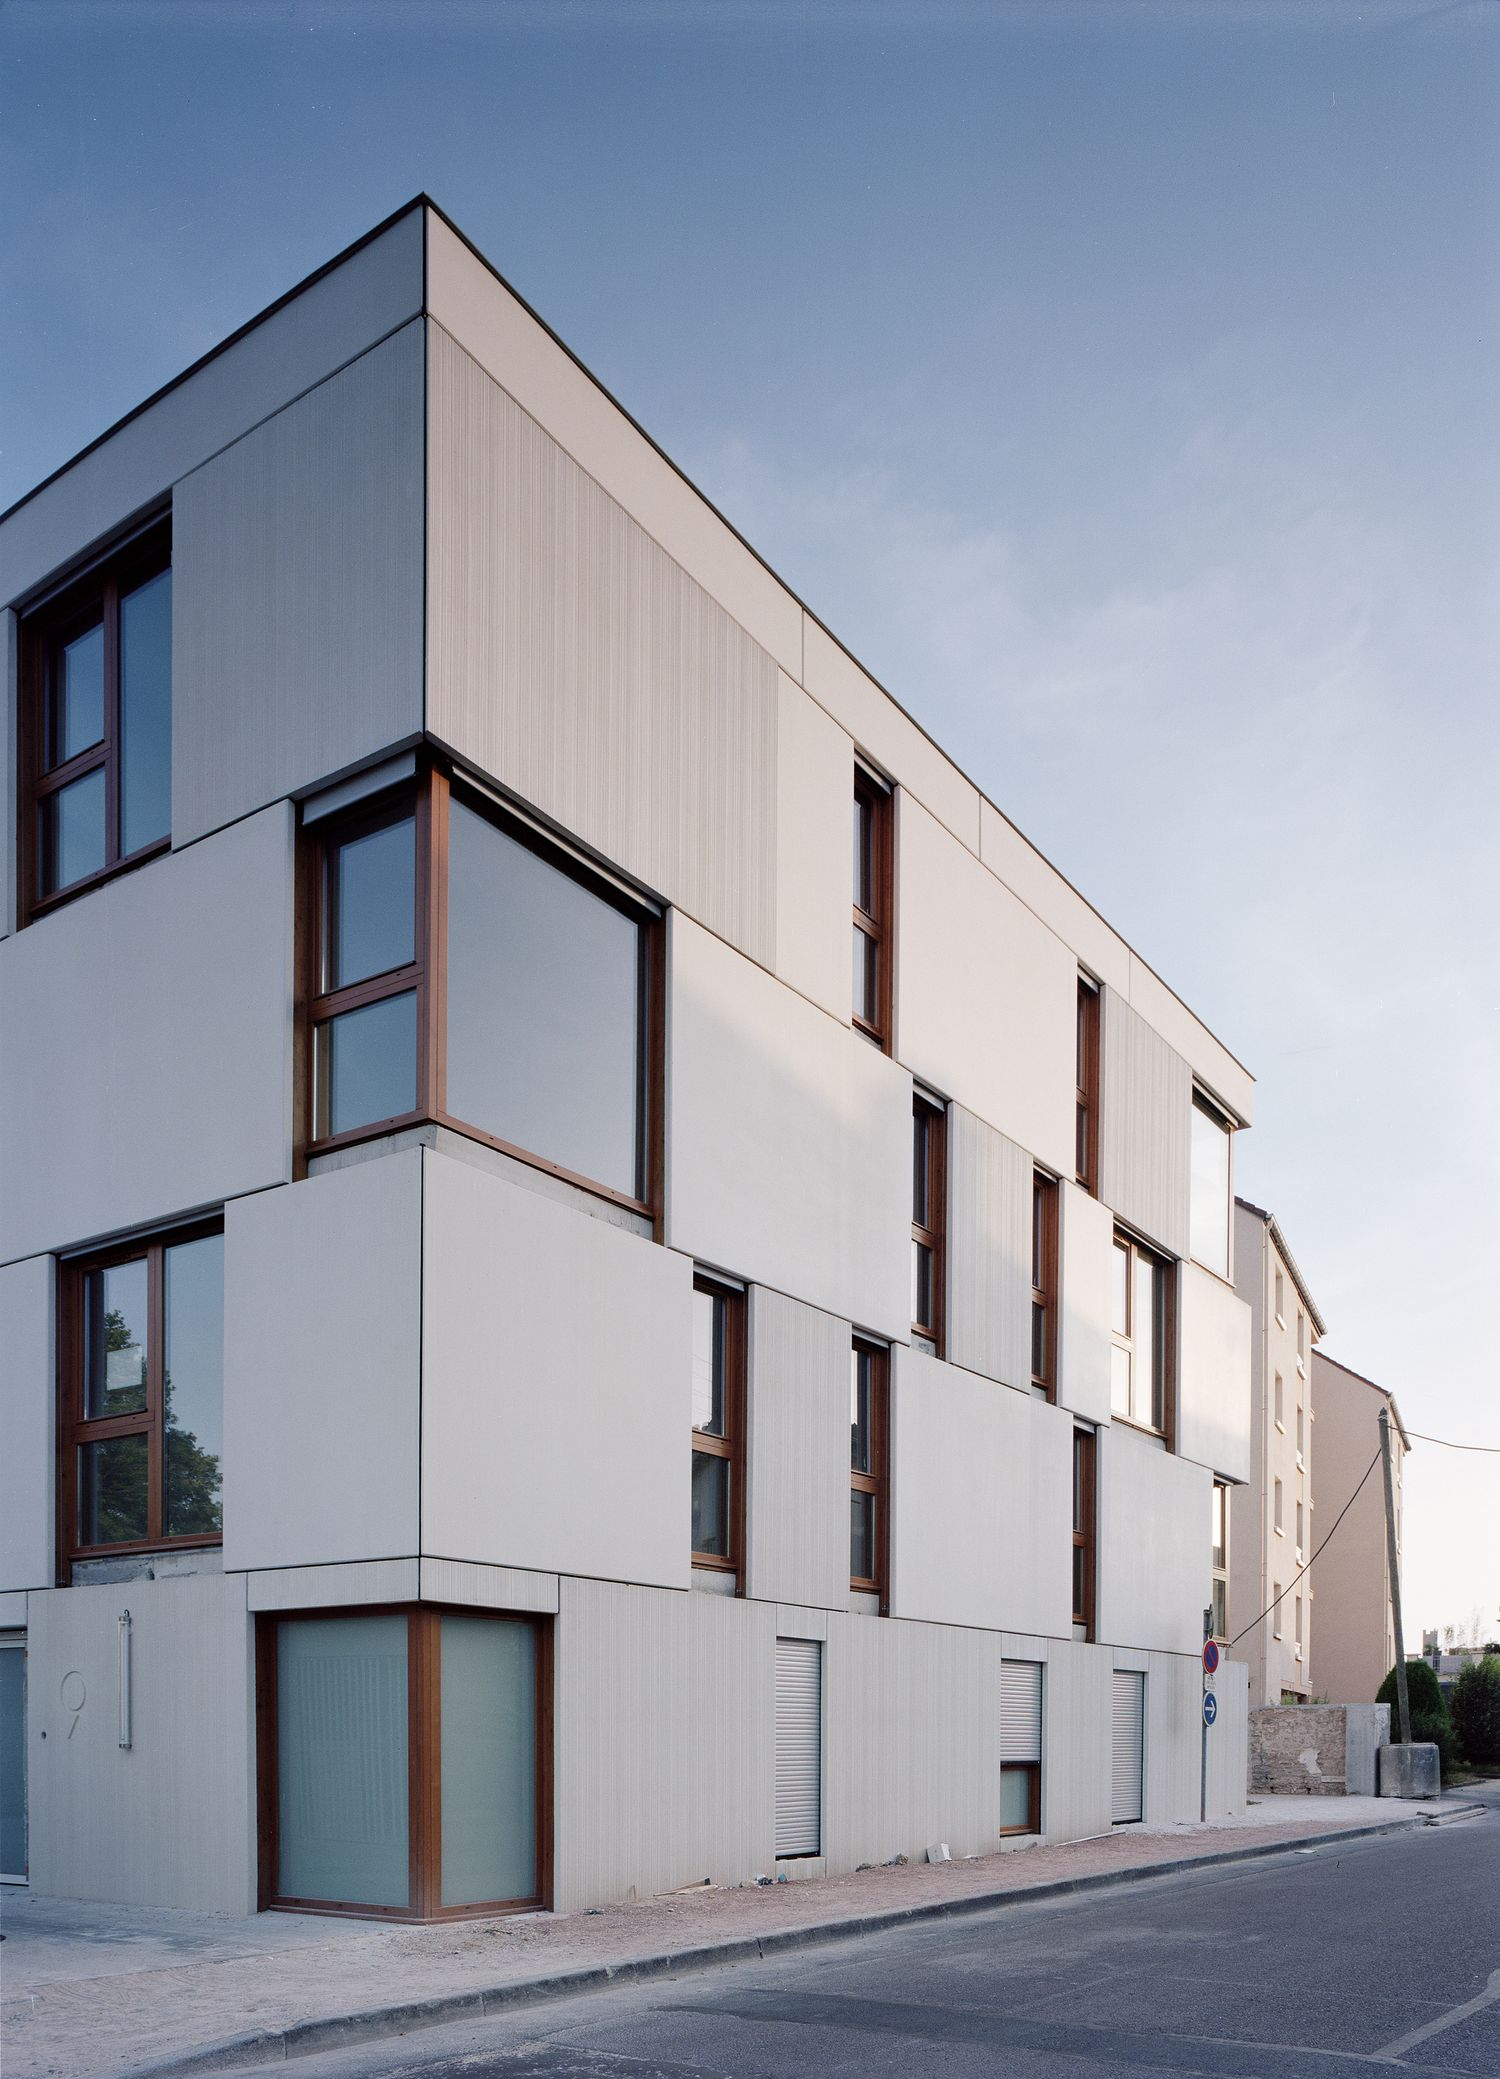 Construction de 20 logements collectifs dijon 21 for Habitat 21 dijon